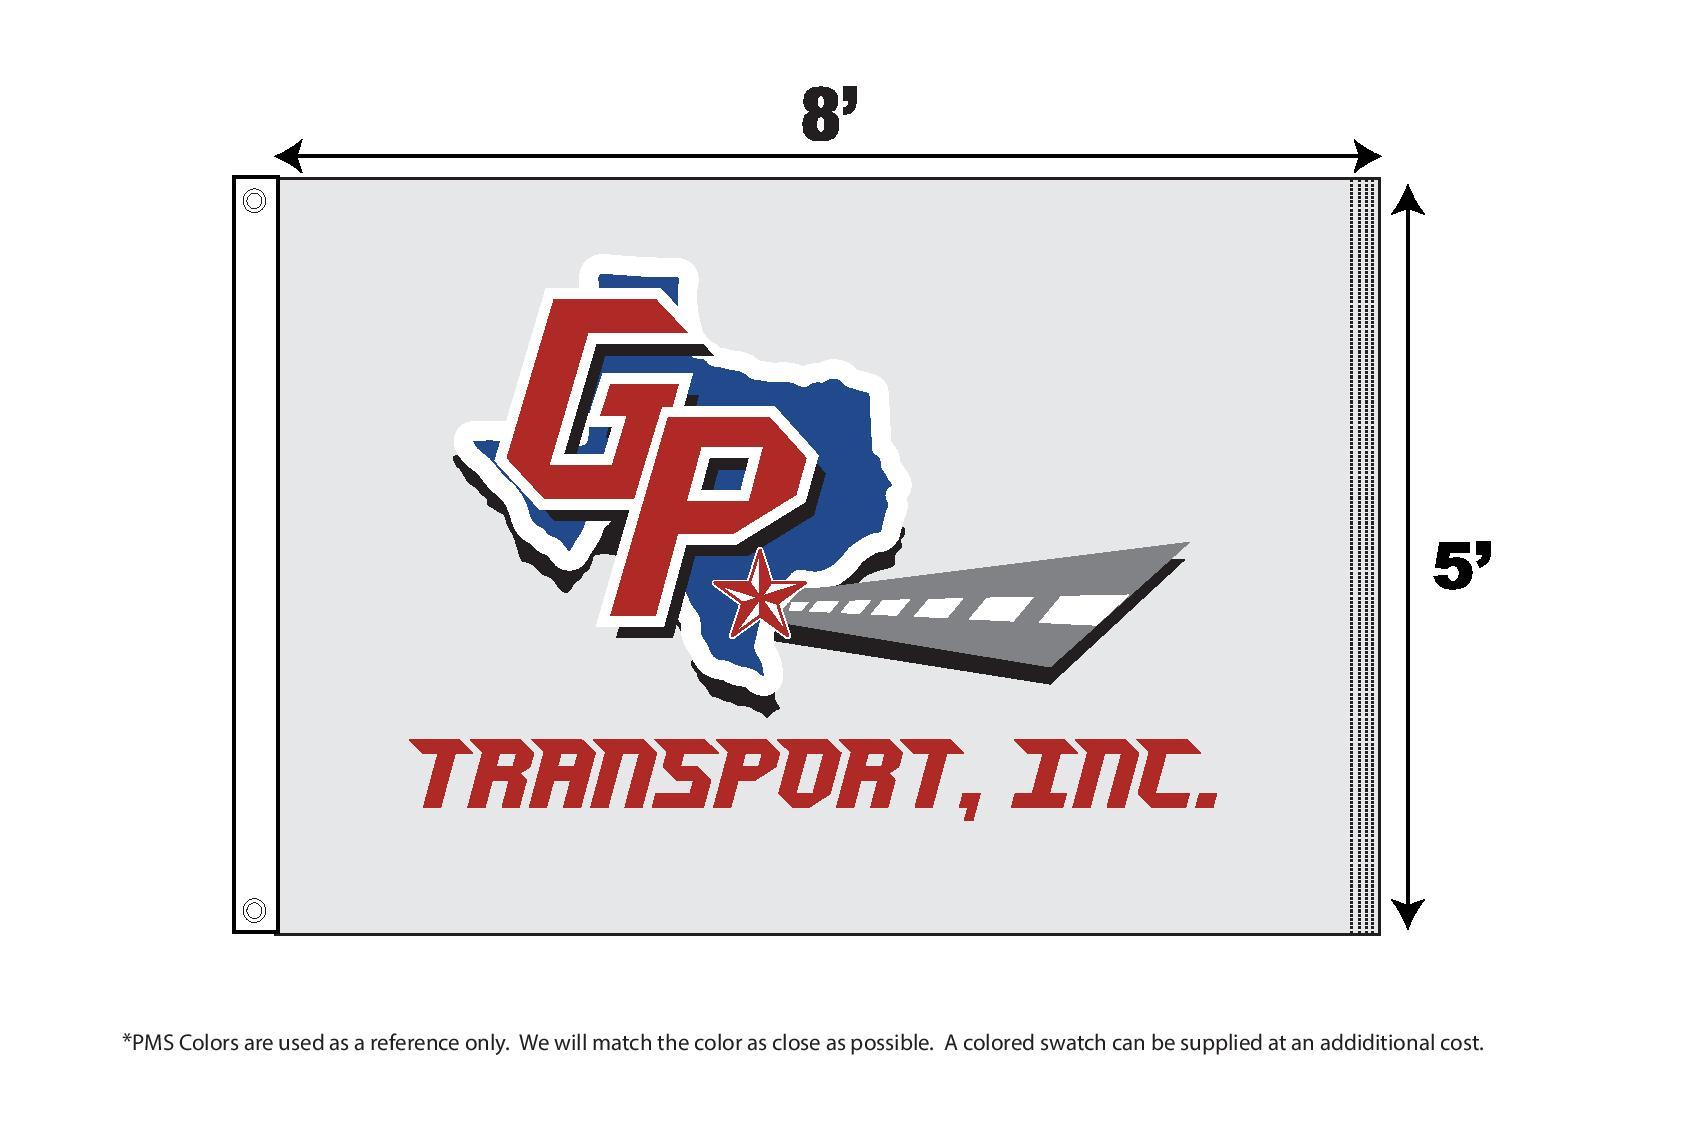 GP Transport